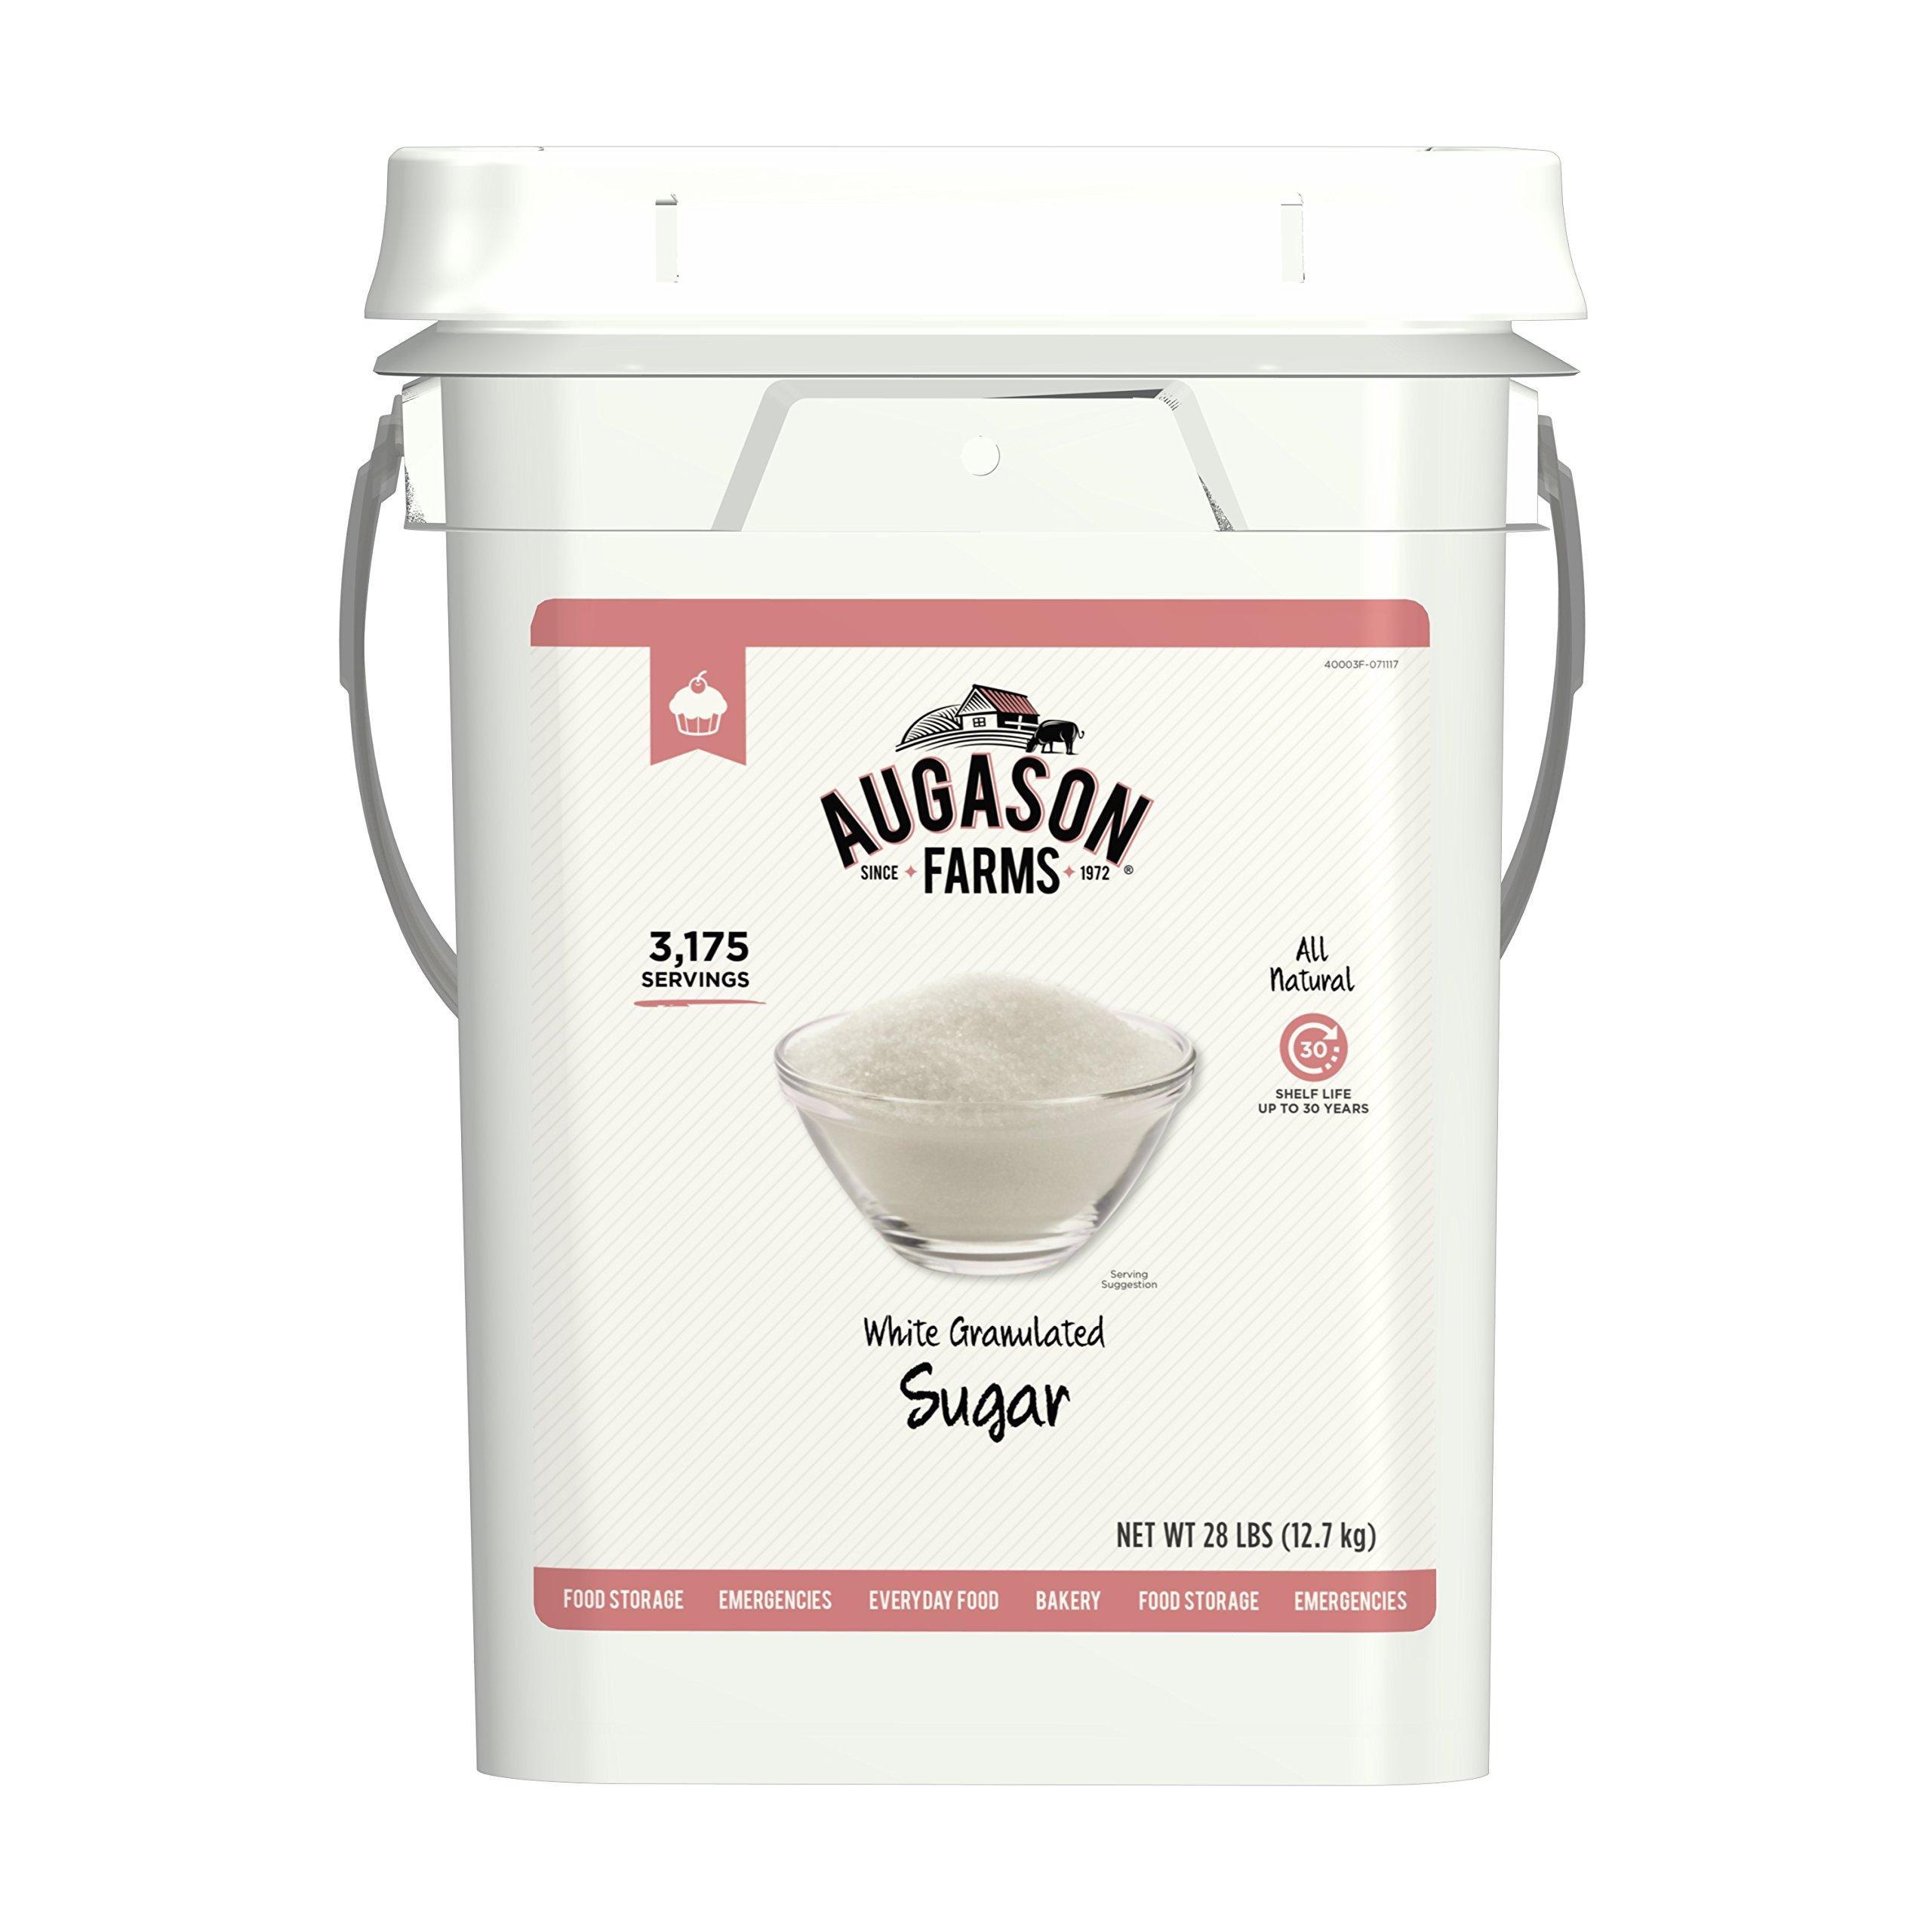 Augason Farms White Granulated Sugar 28 Pound Pail by Augason Farms